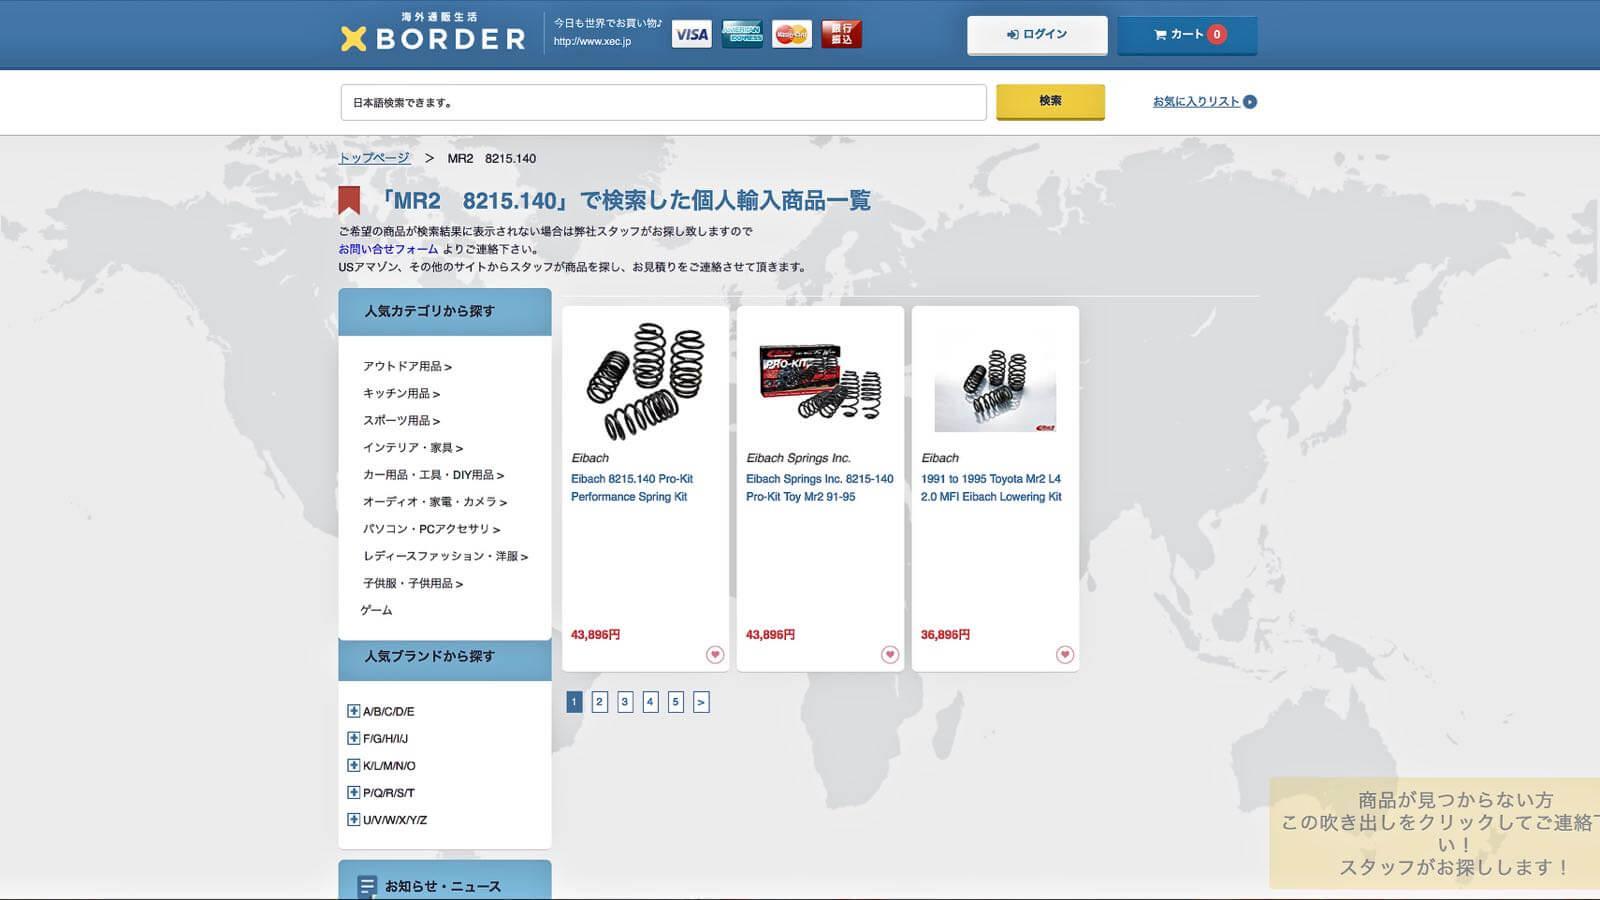 0145 MR2 Restore Plan  Part 18 06 XBORDER Border purchase screen